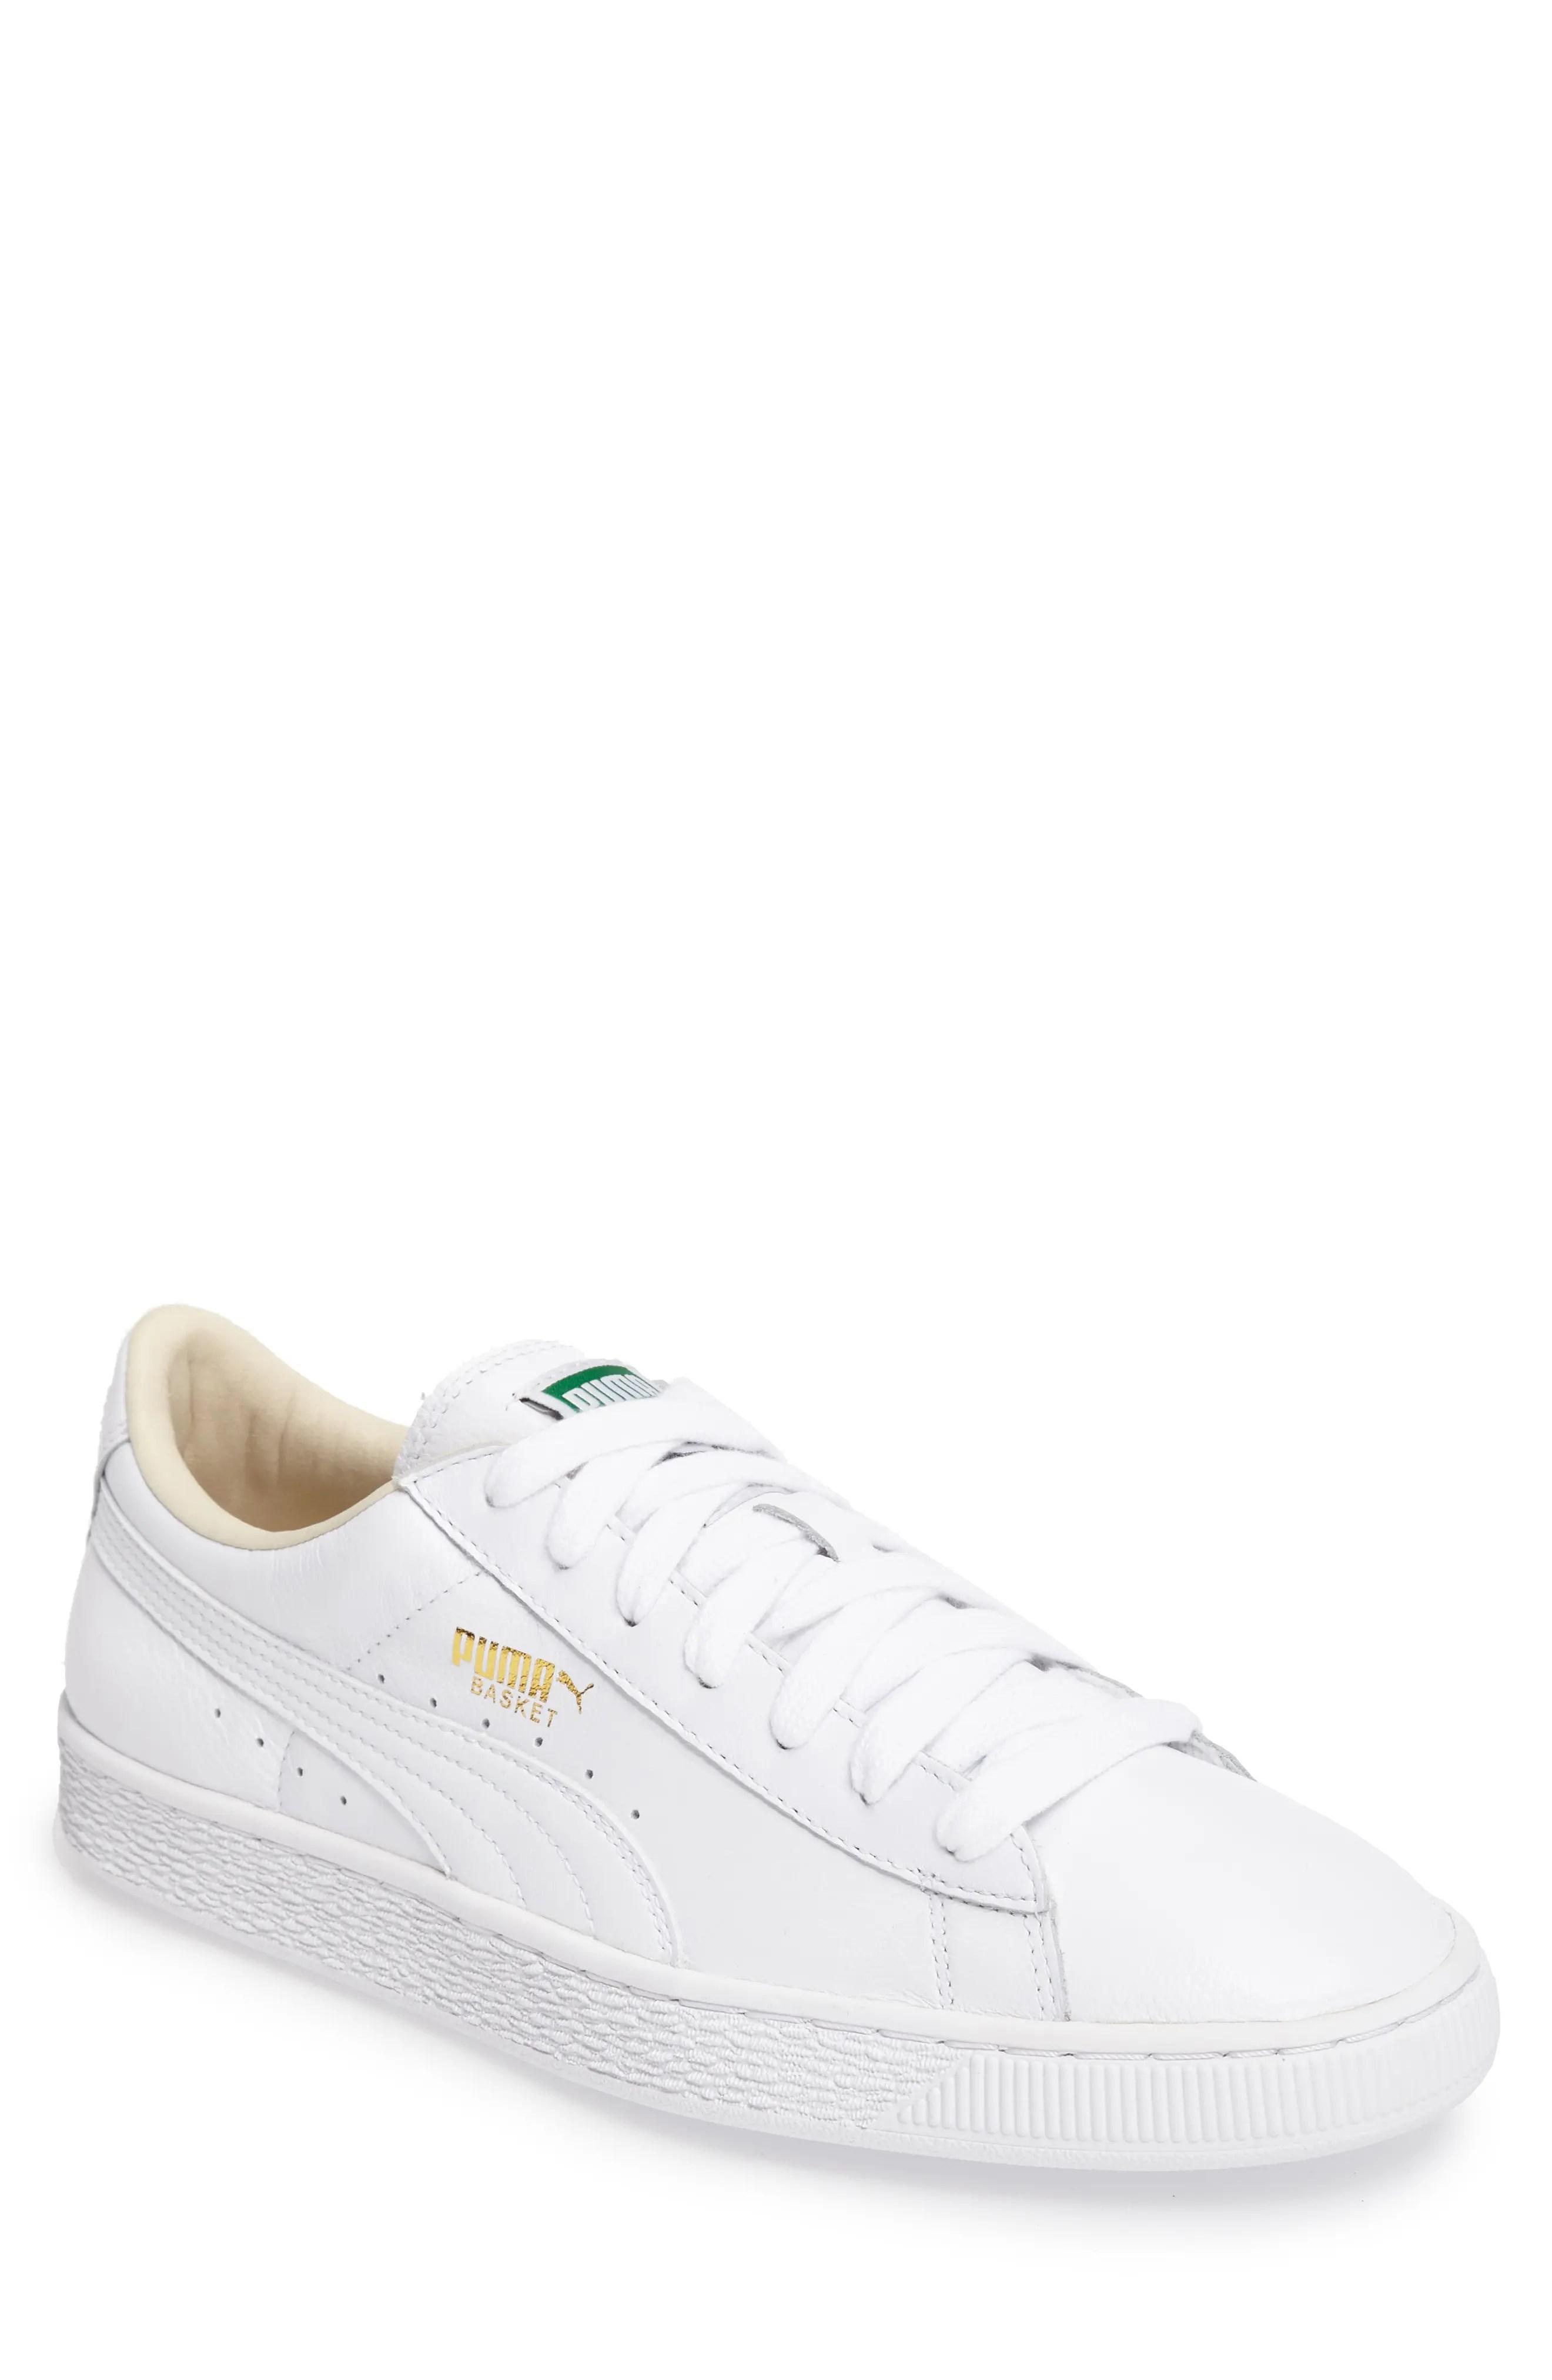 tennis shoes for men nordstrom rack